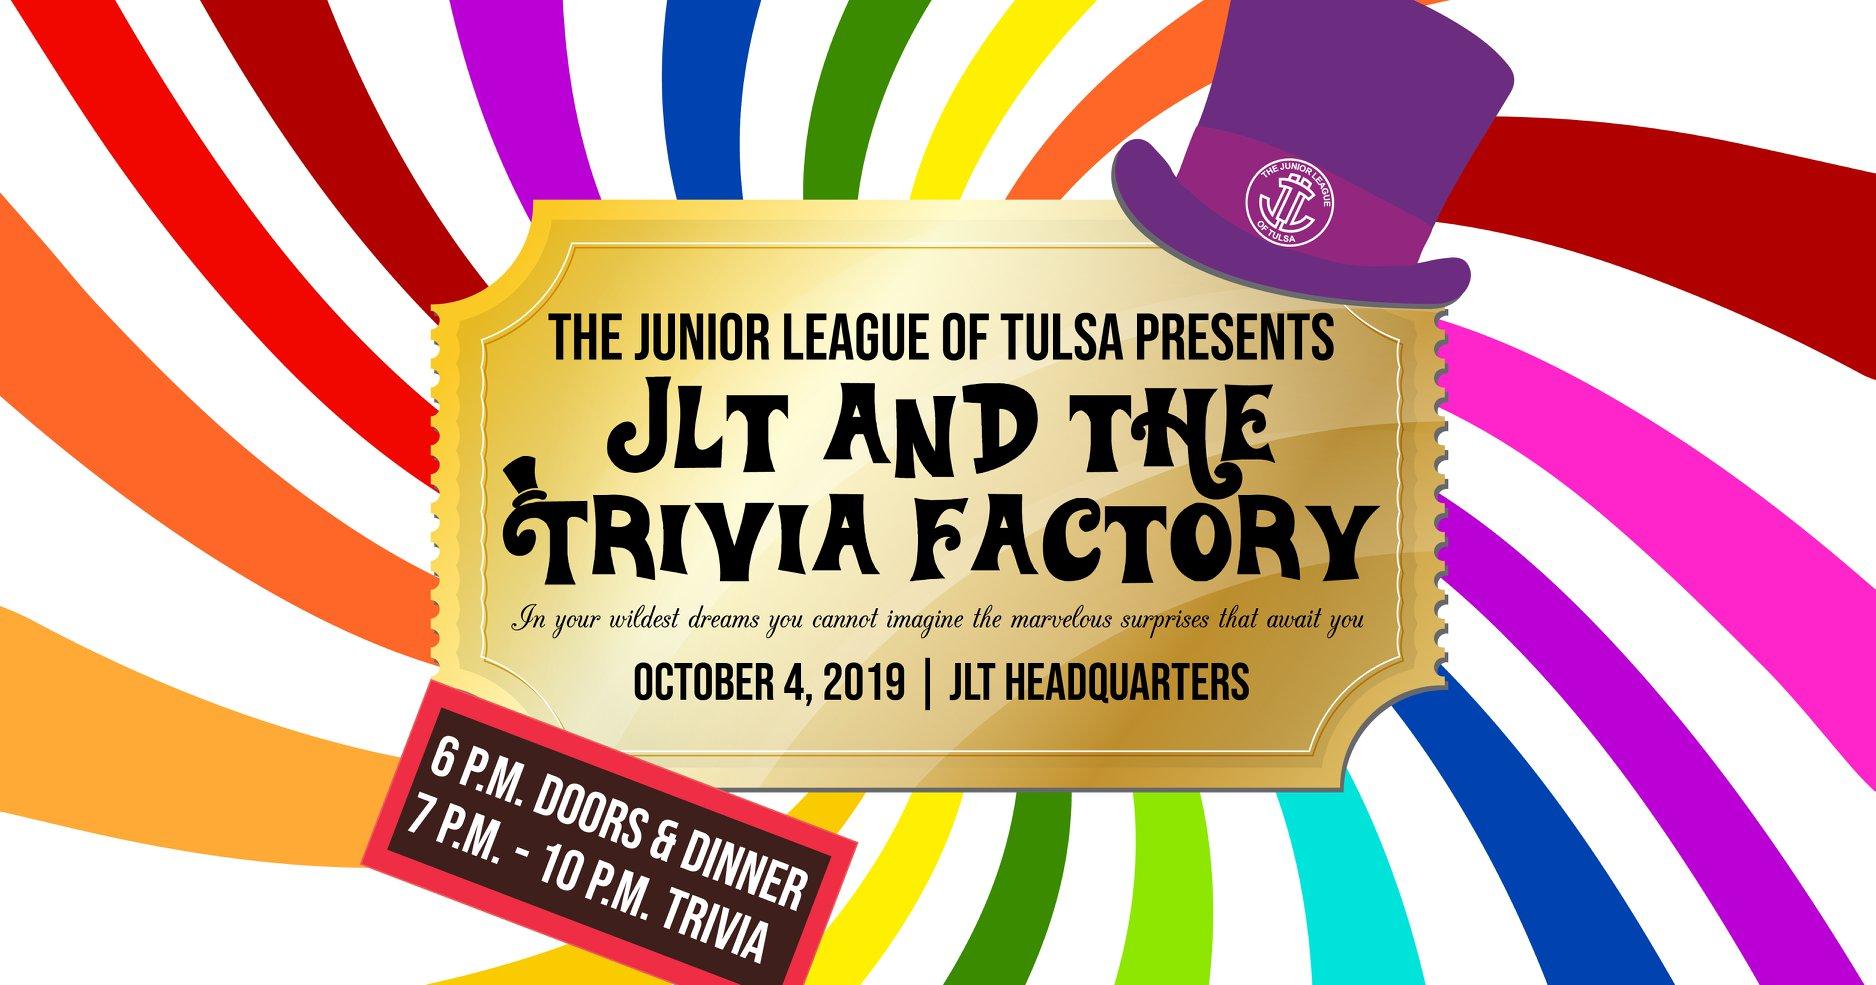 Trivia Factory 1